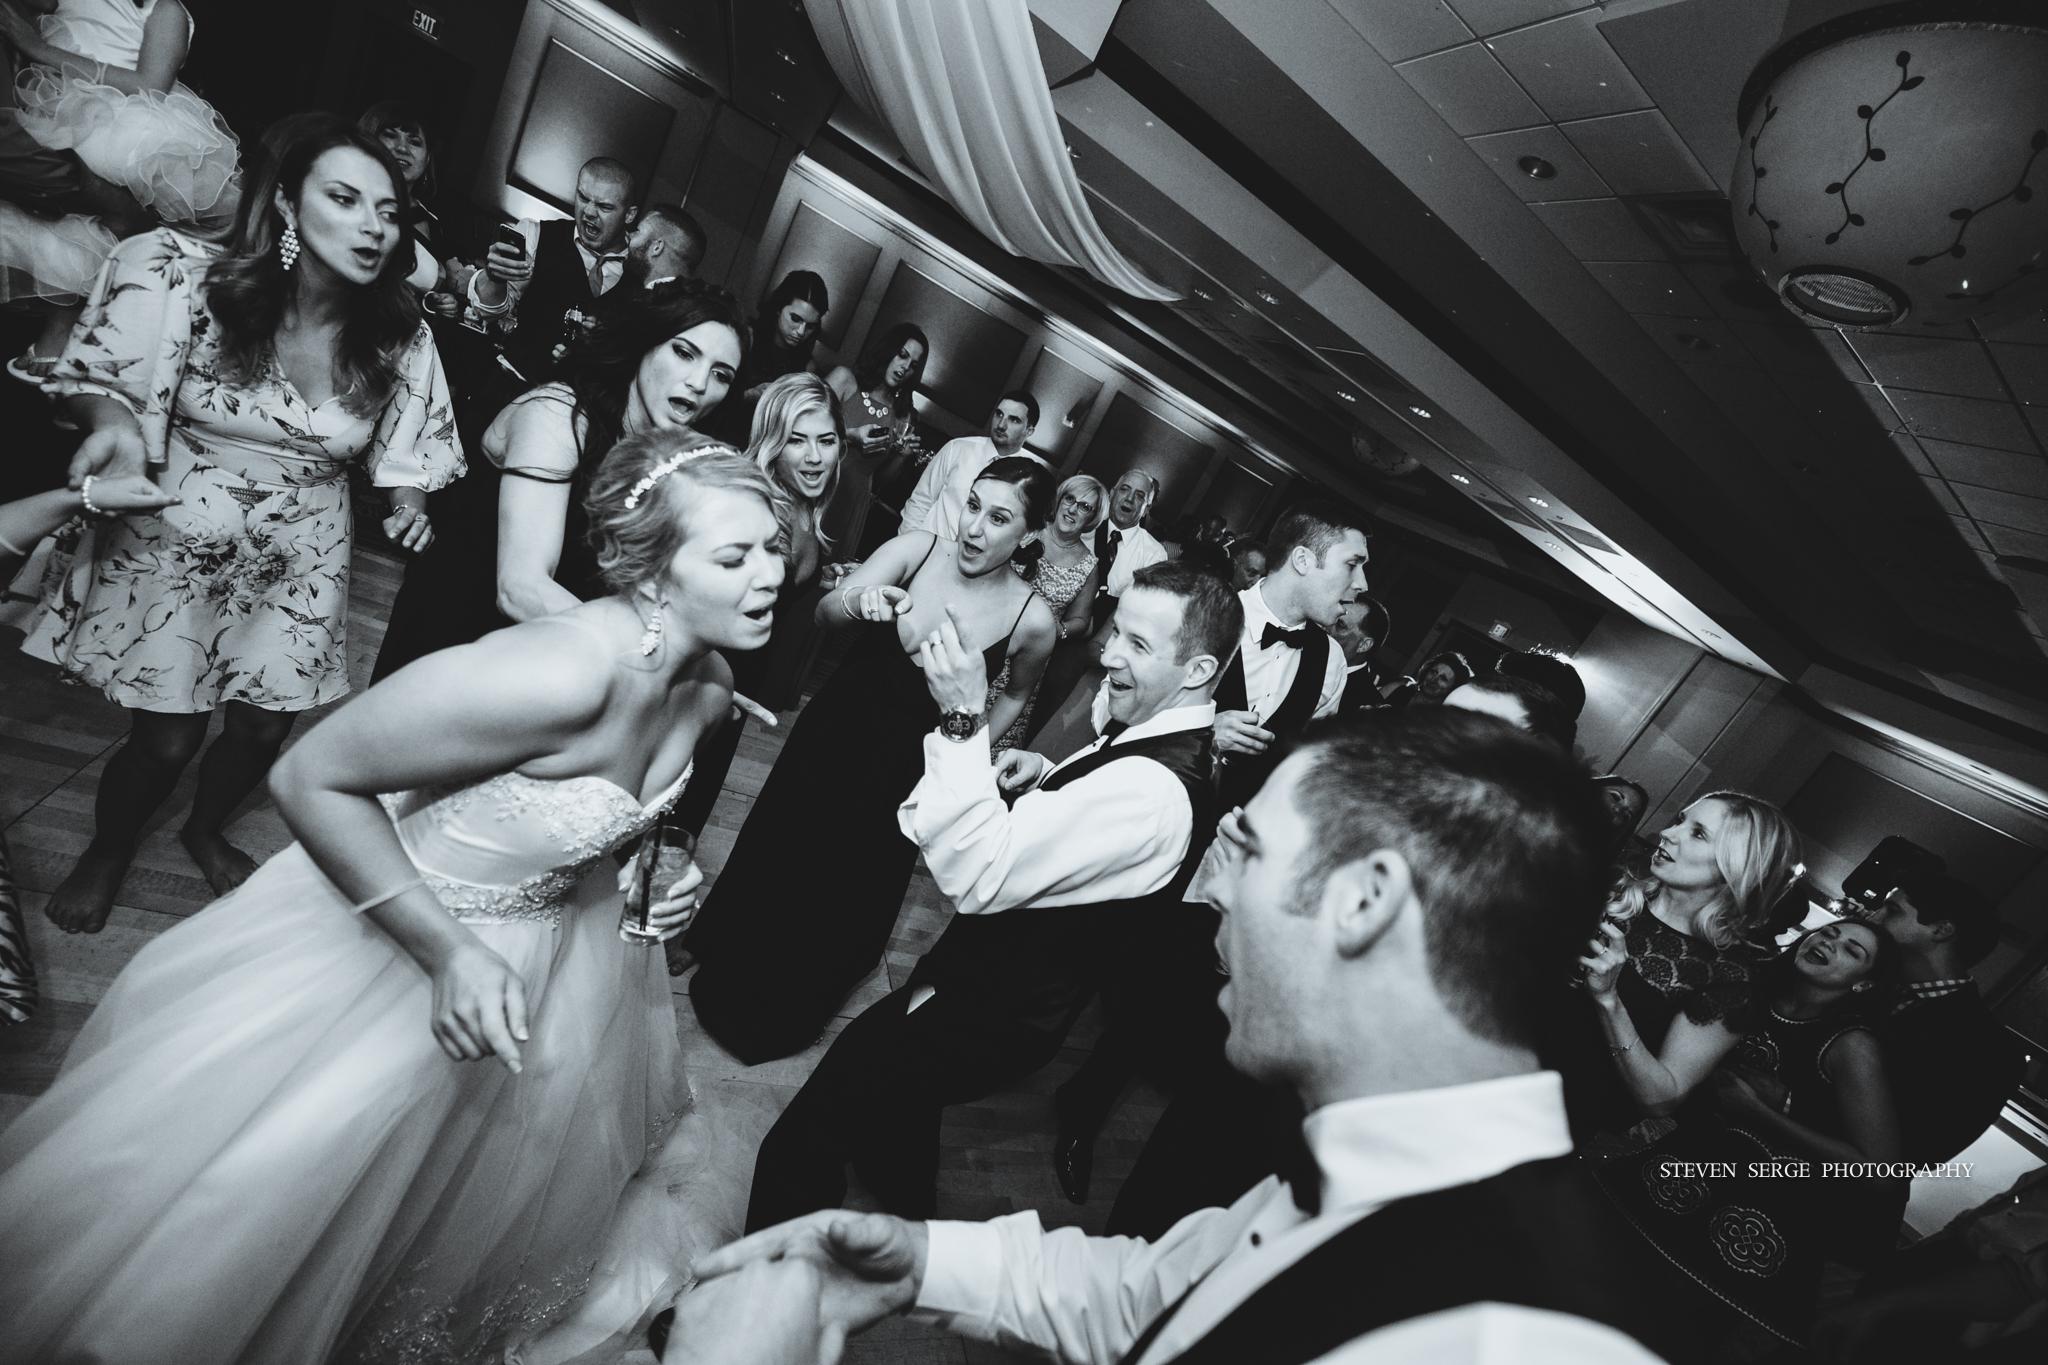 scranton-wedding-photographers-hilton-steven-serge-photography-41.jpg